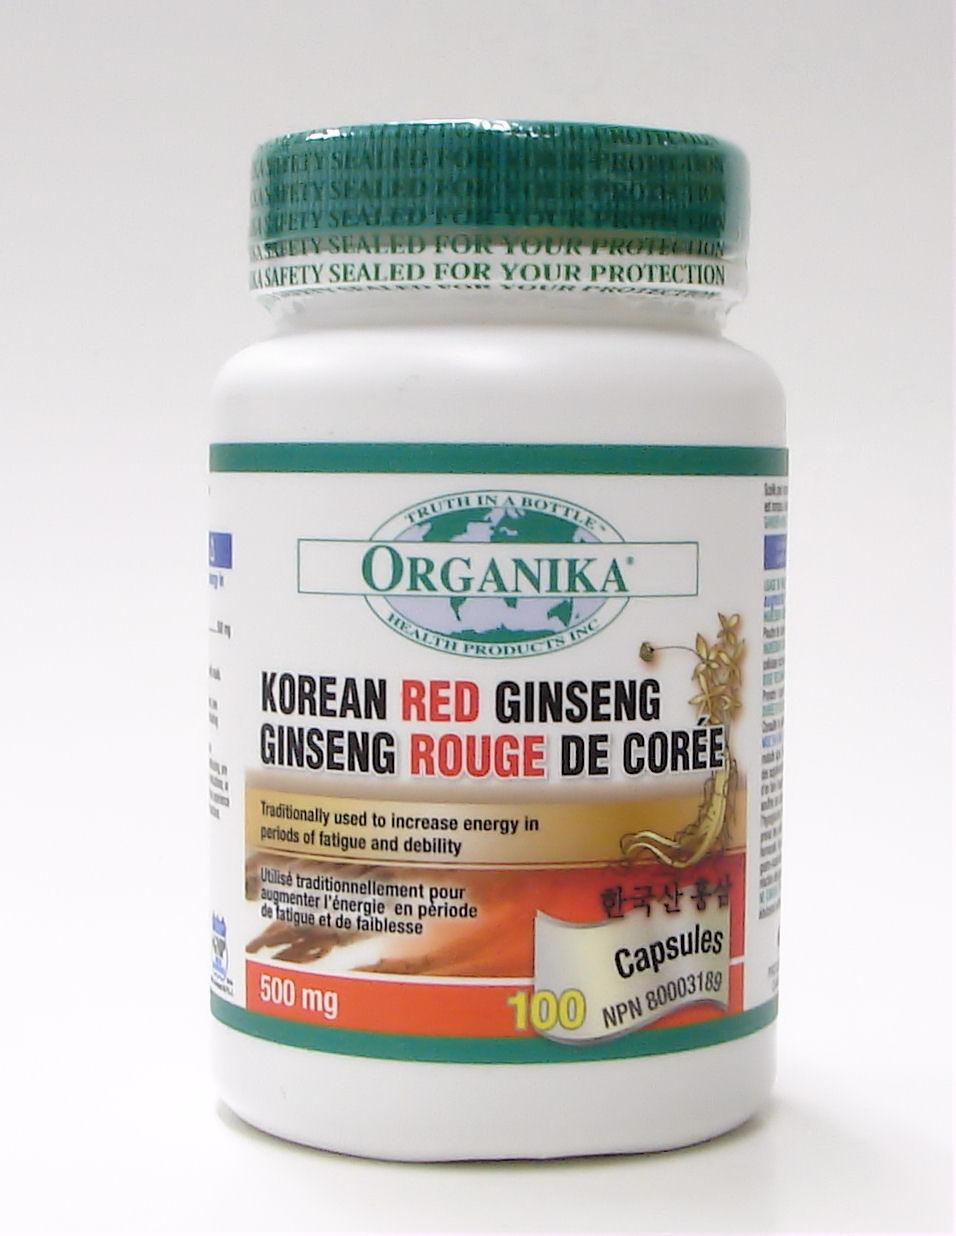 Korean Red Ginseng, 500 mg, 100 caps (organika)